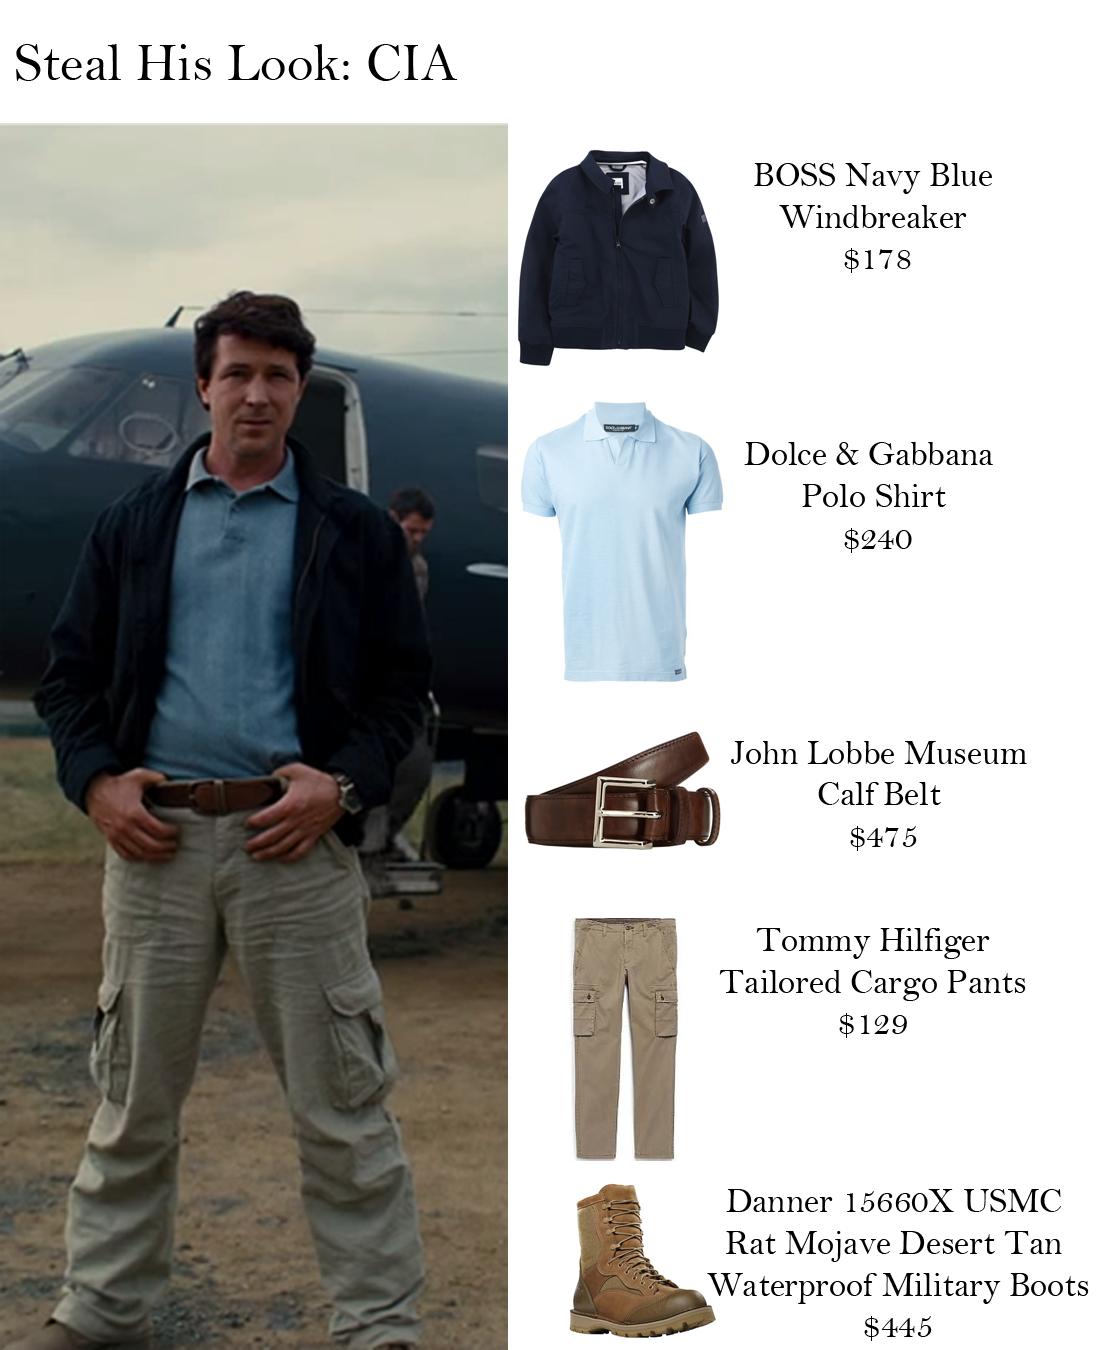 Steal His Look: CIA BOSS Navy Blue Windbreaker $178 Dolce & Gabbana Polo  Shirt $240